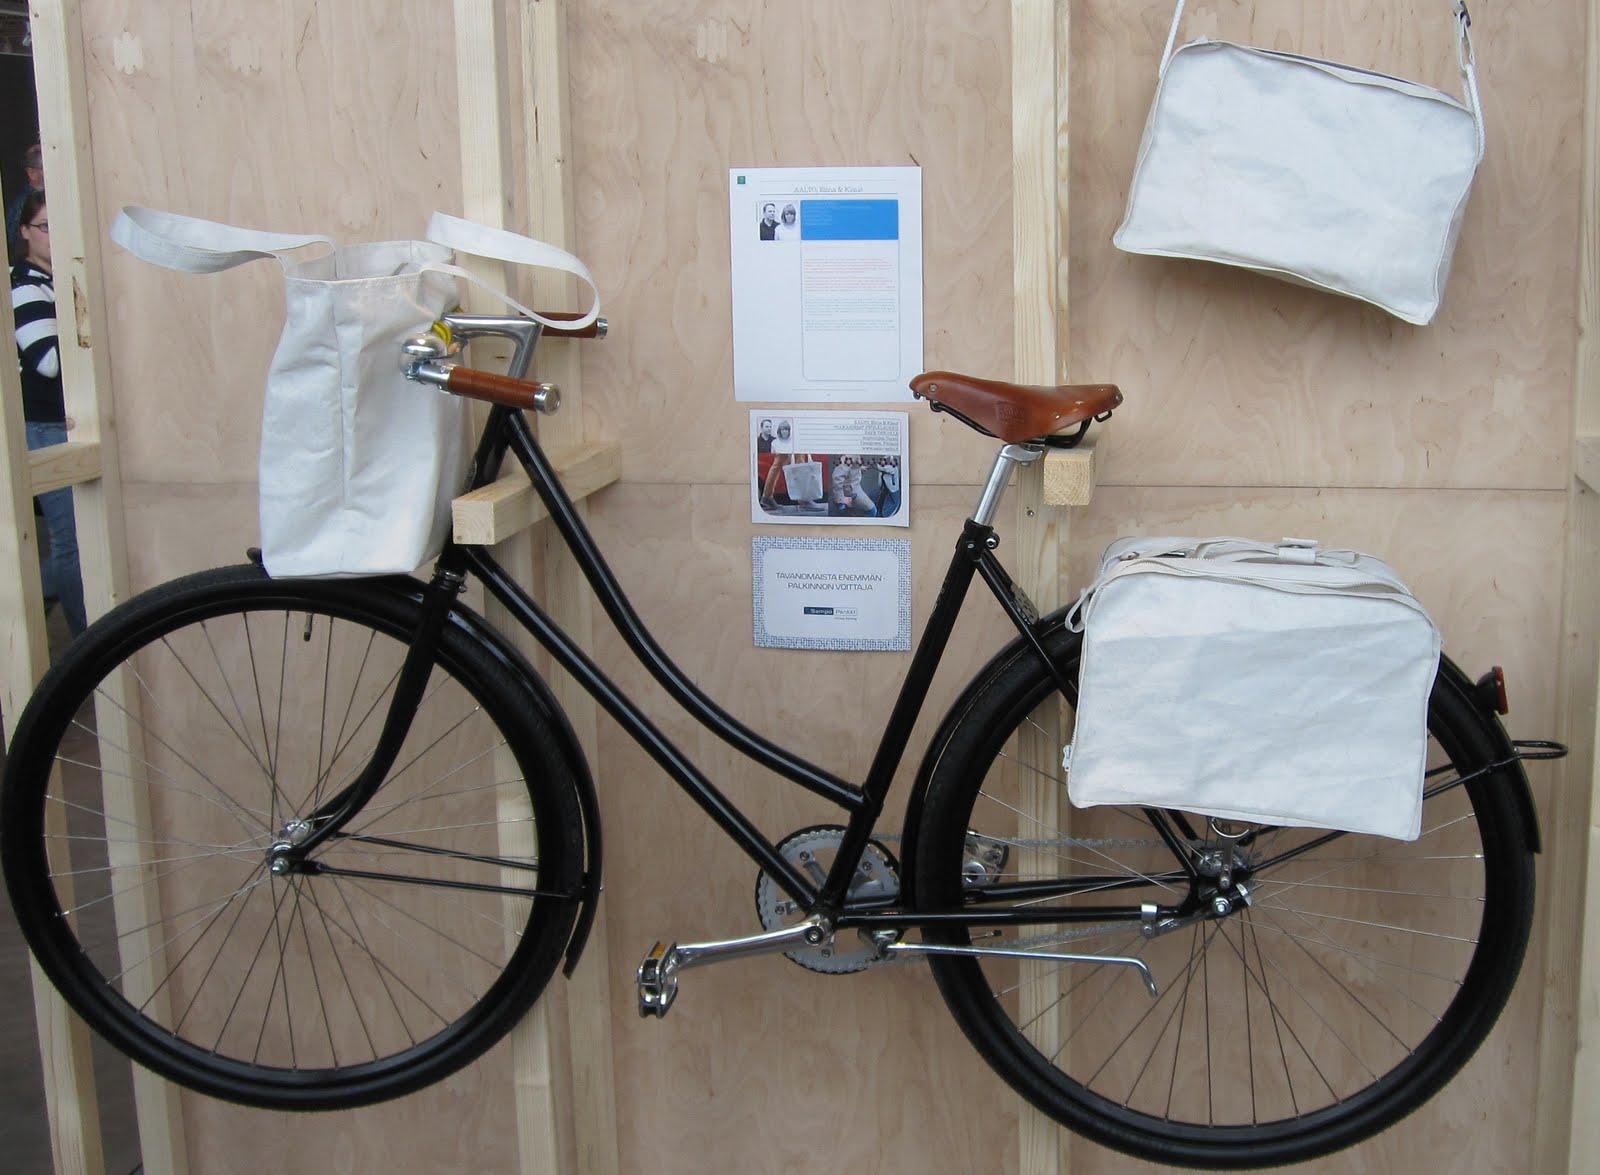 sacs finlandais pour v lo myvision myvision. Black Bedroom Furniture Sets. Home Design Ideas